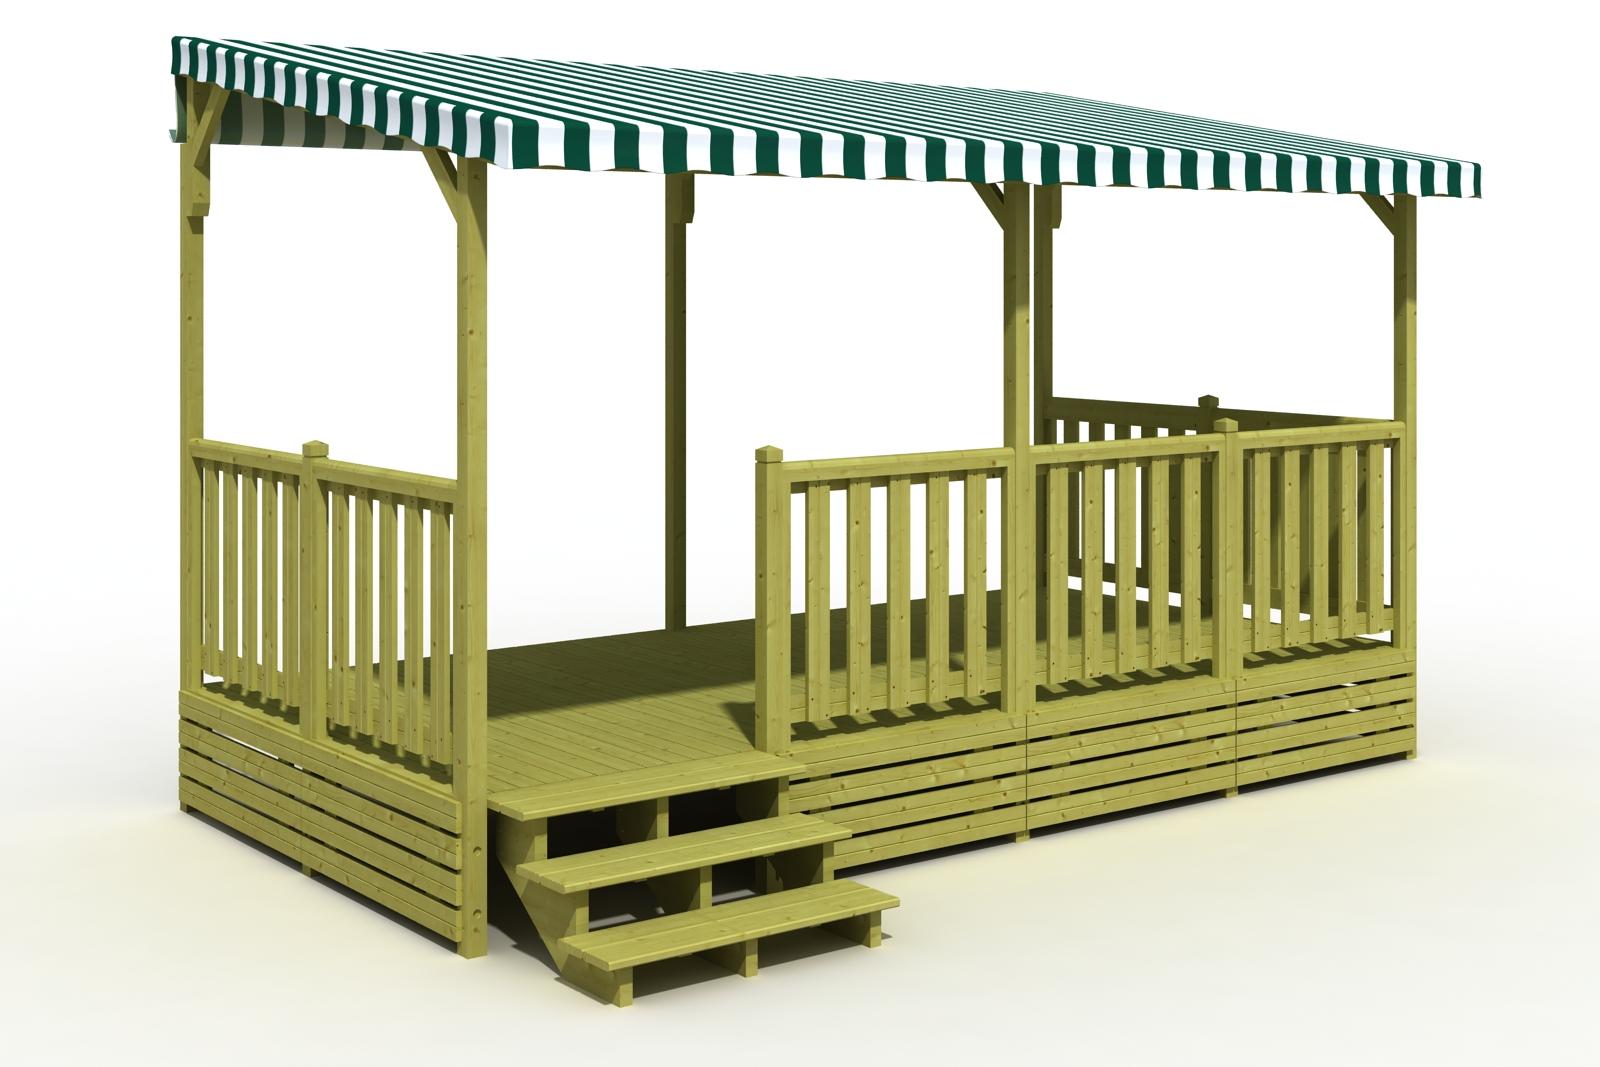 Couverte  Terrasse Mobil Home  Deckit  Fabricant terrasses en bois